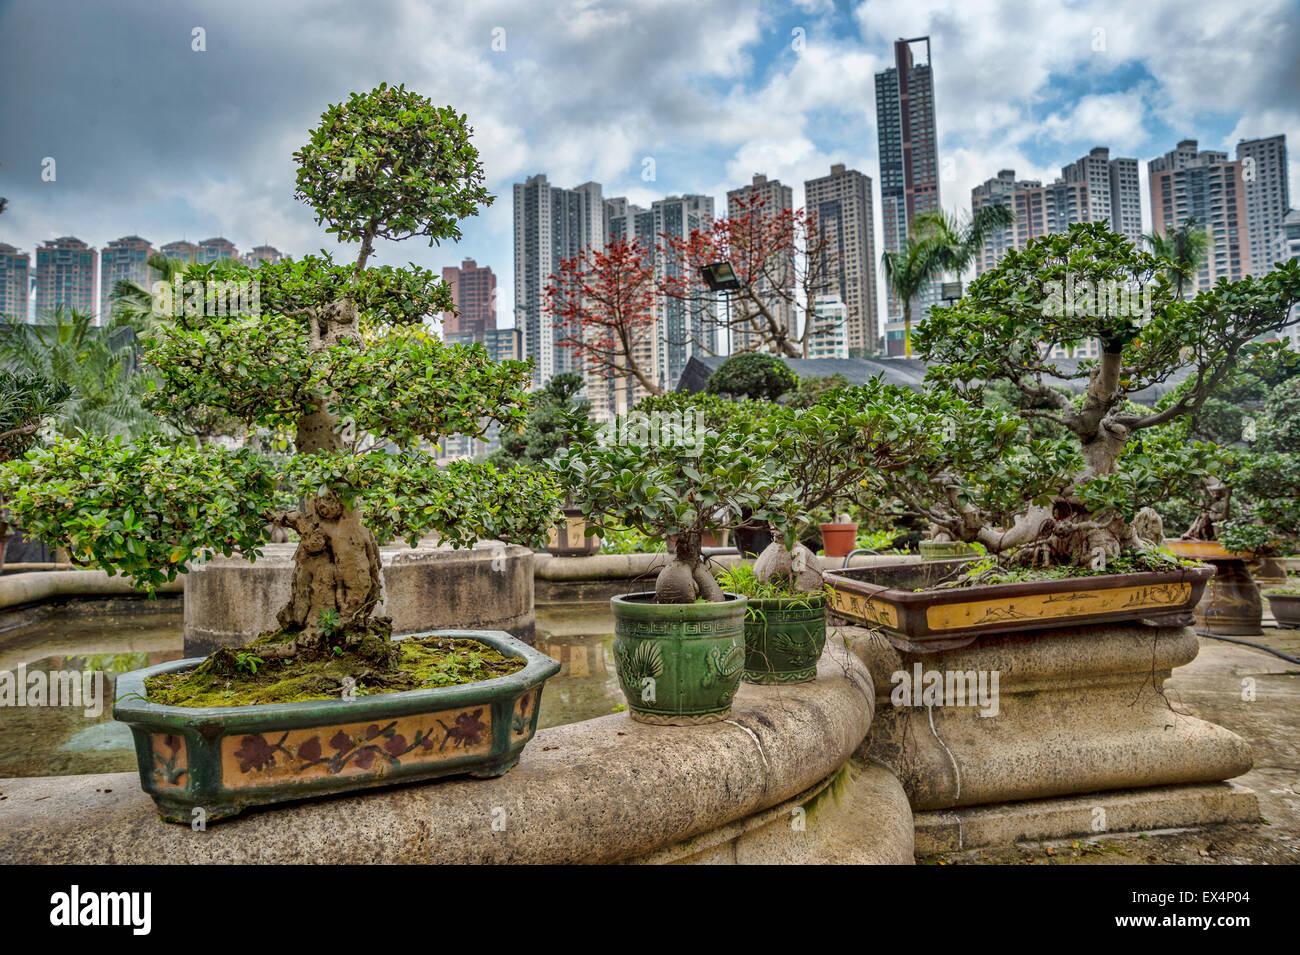 bonsai exhibition stockfotos bonsai exhibition bilder alamy. Black Bedroom Furniture Sets. Home Design Ideas